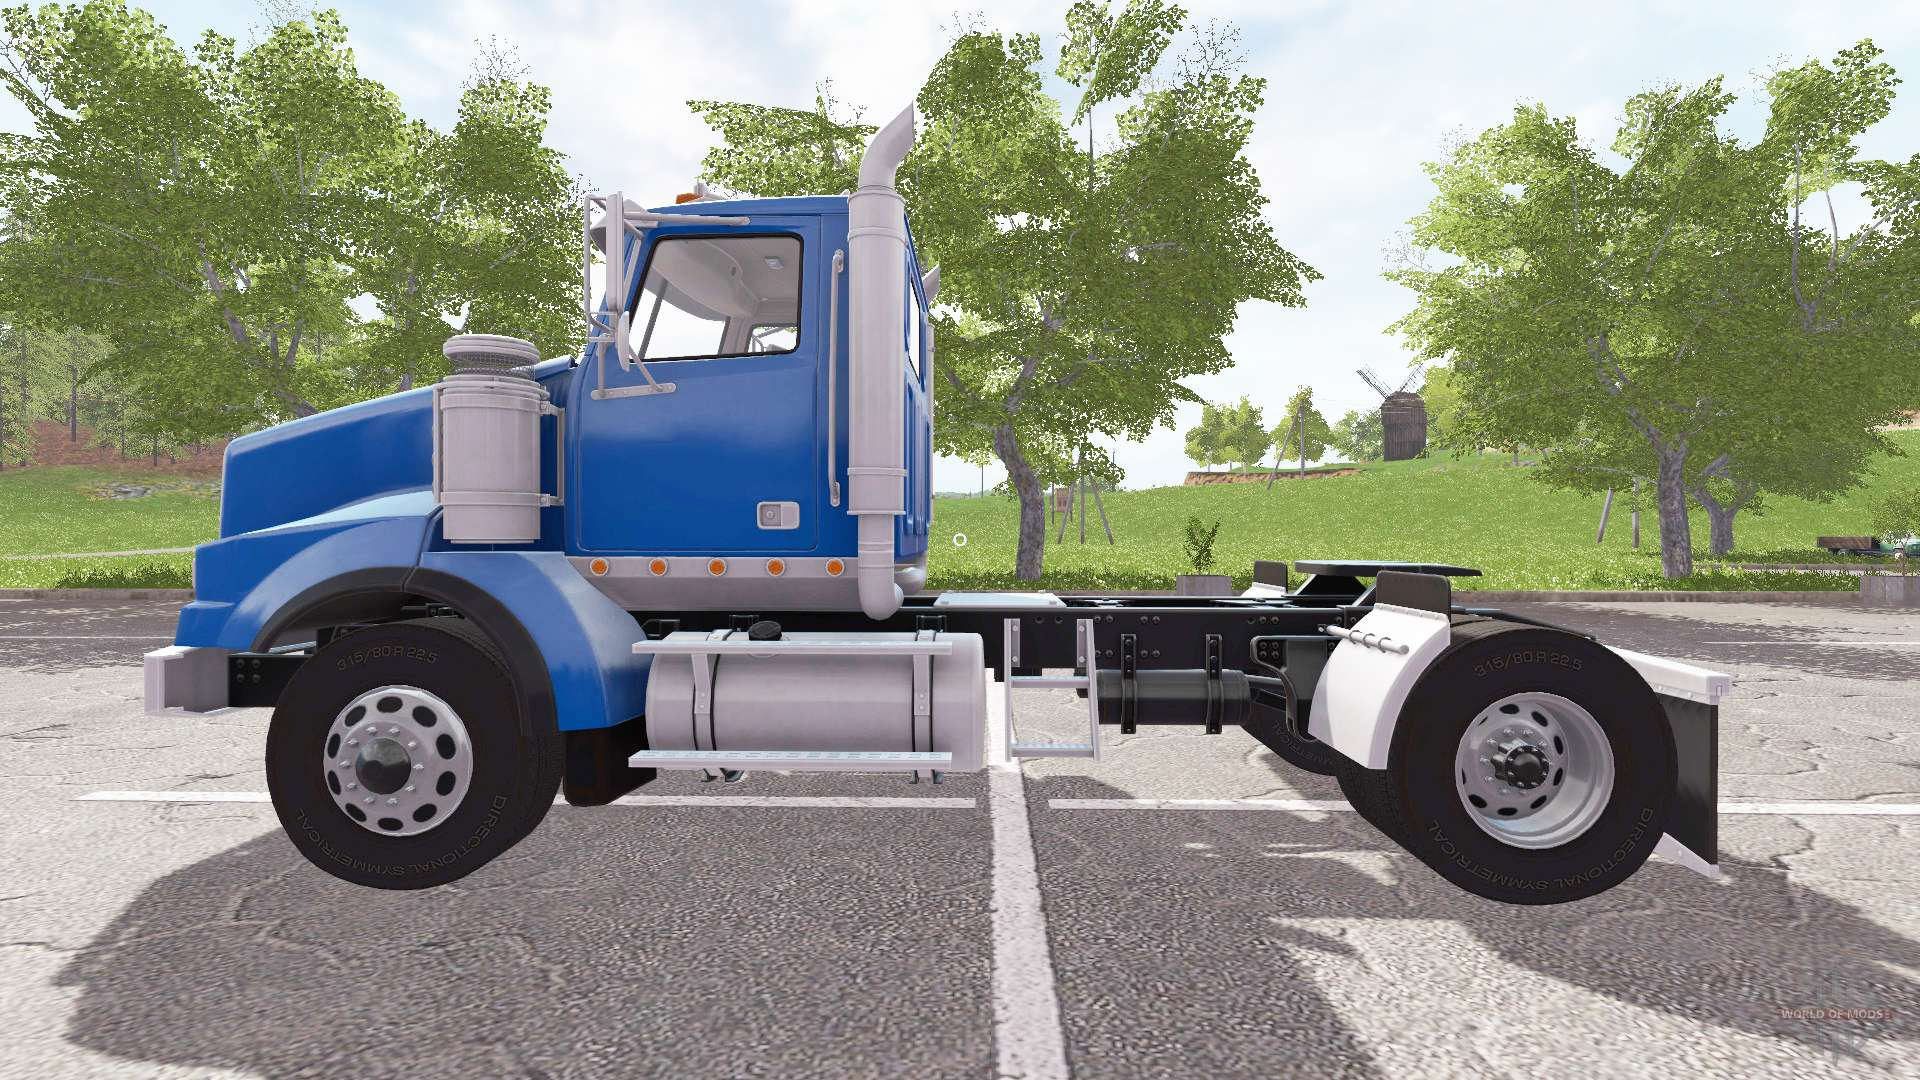 lizard sx 210 twinstar engine options f r farming. Black Bedroom Furniture Sets. Home Design Ideas